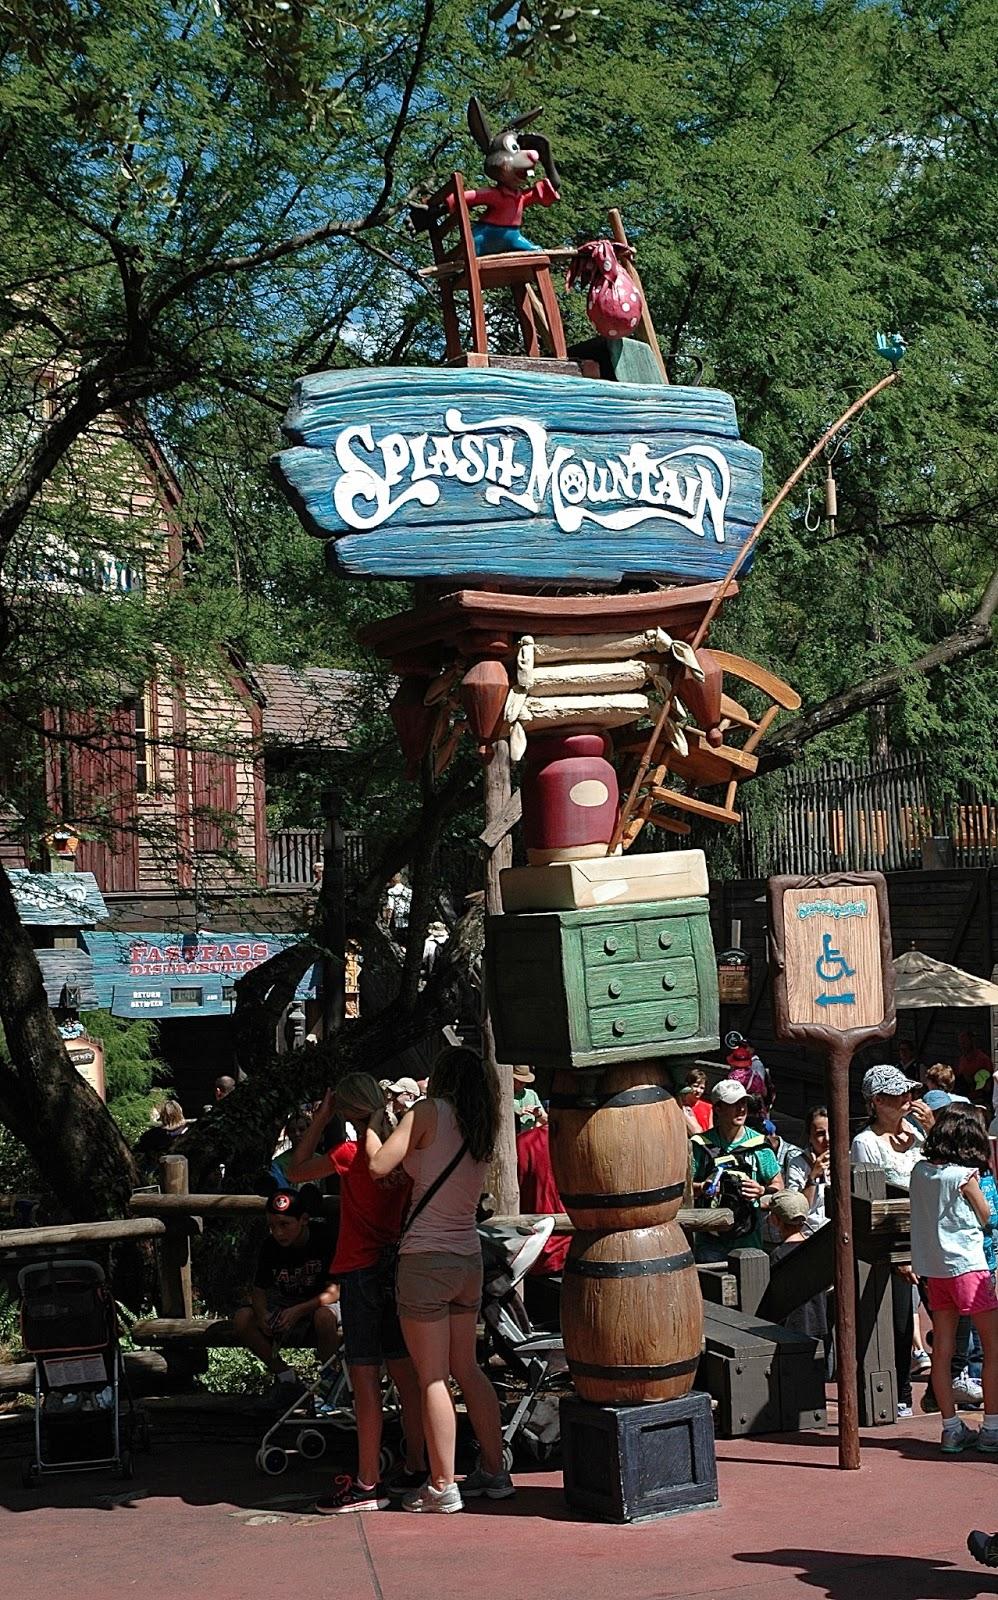 Walt Disney World - Travel: Did You Know...Splash Mountain